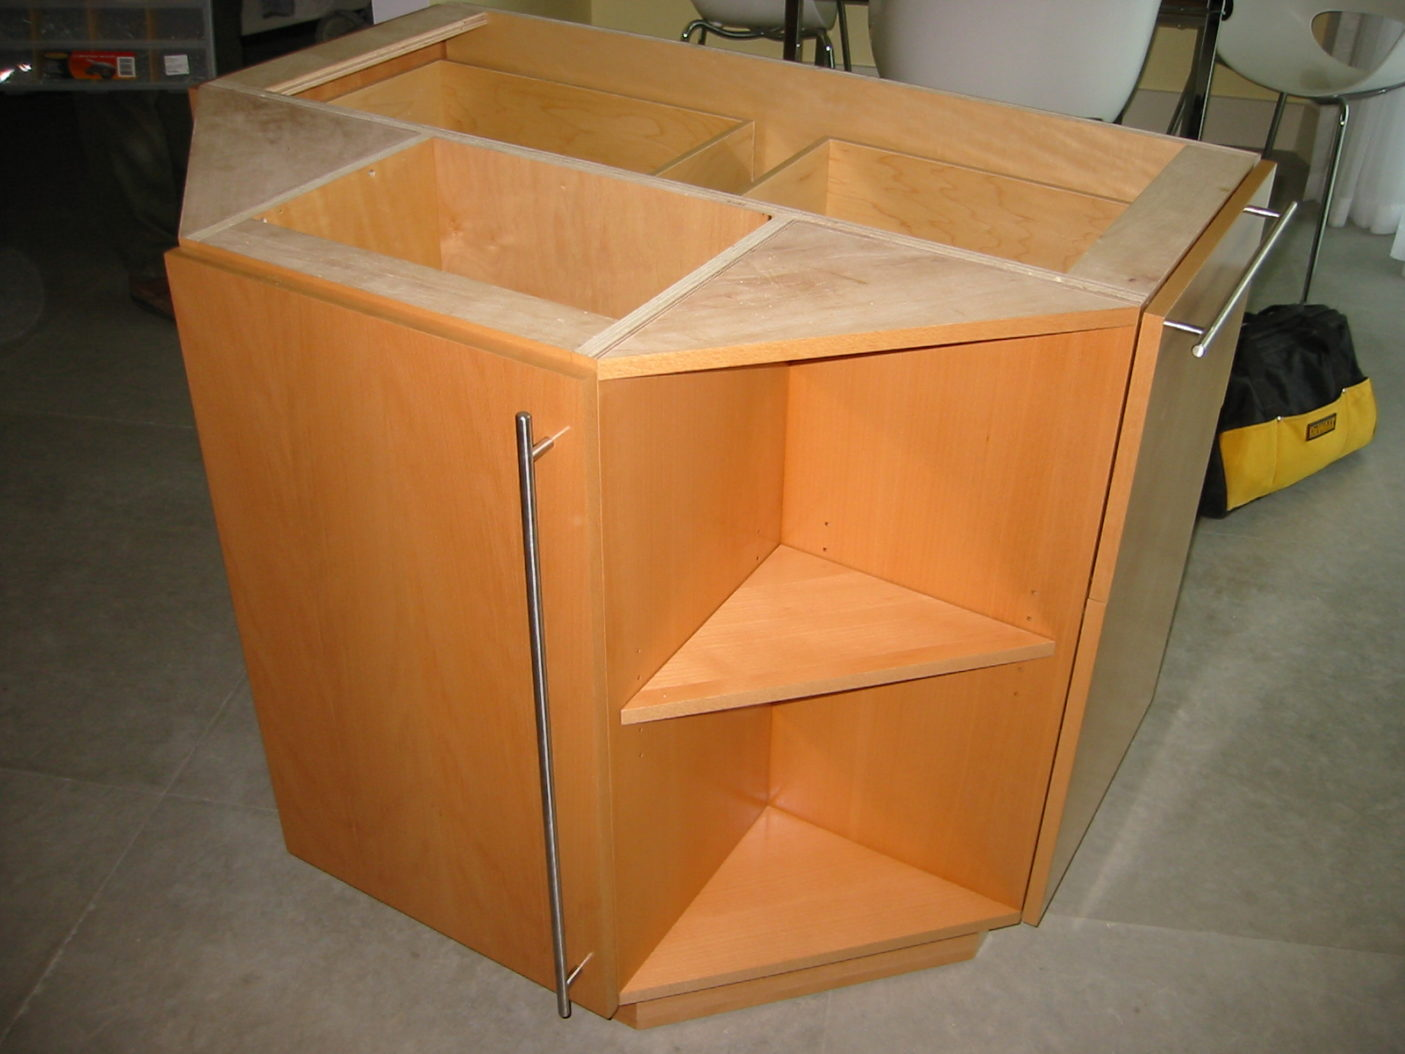 Kitchens-159.jpg